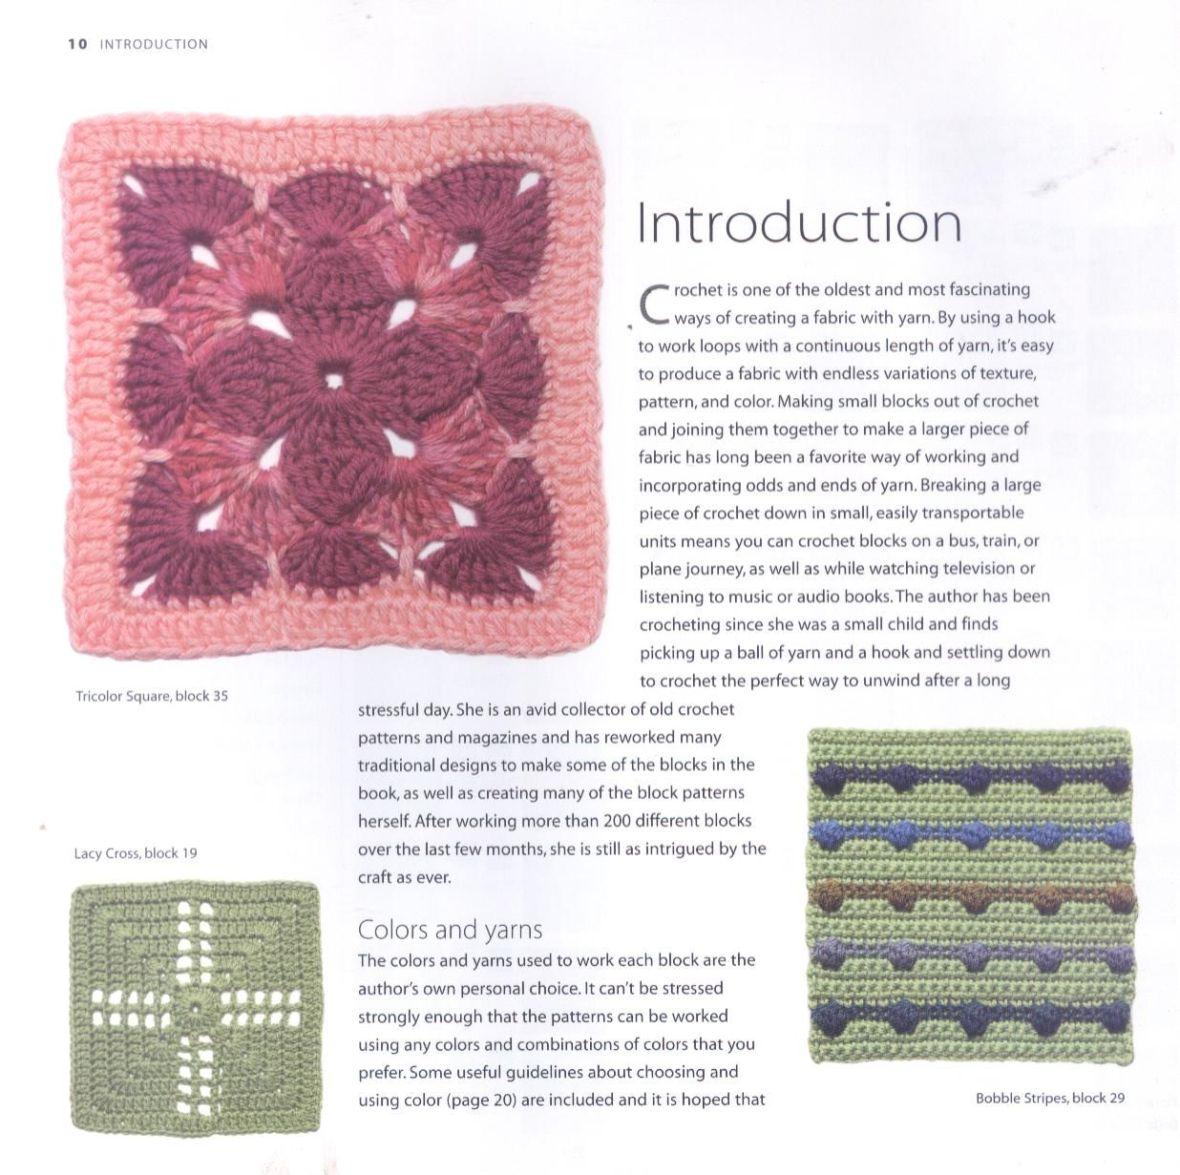 200 Crocheted Blocks for blankets, throws & Afghans 010